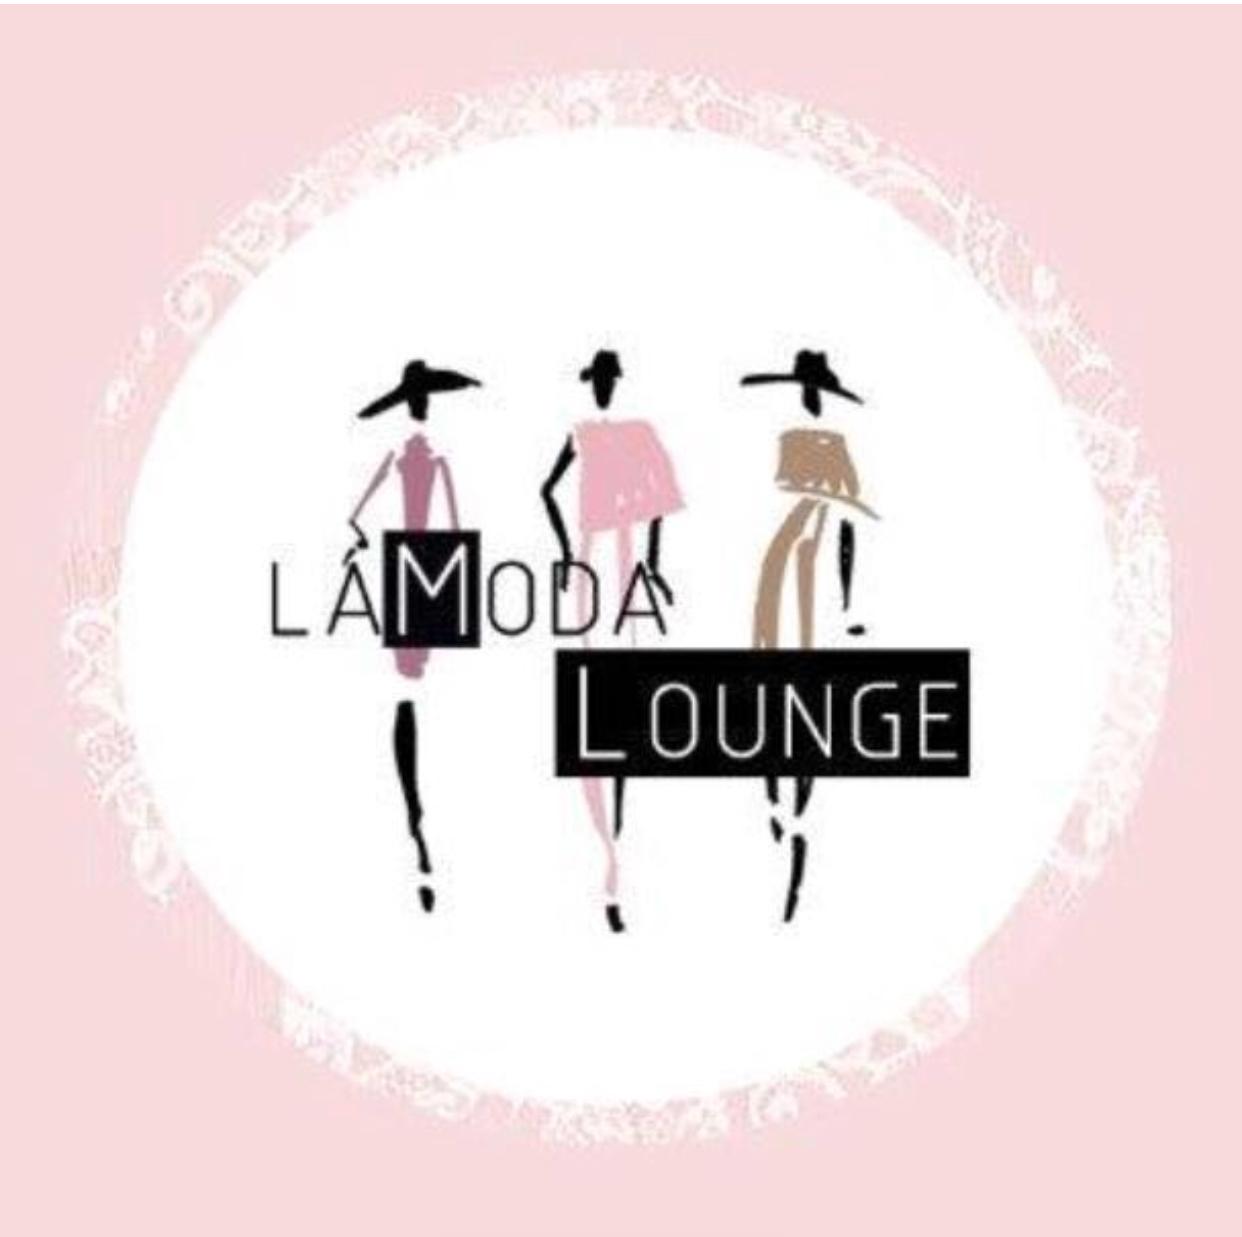 Lamoda lounge